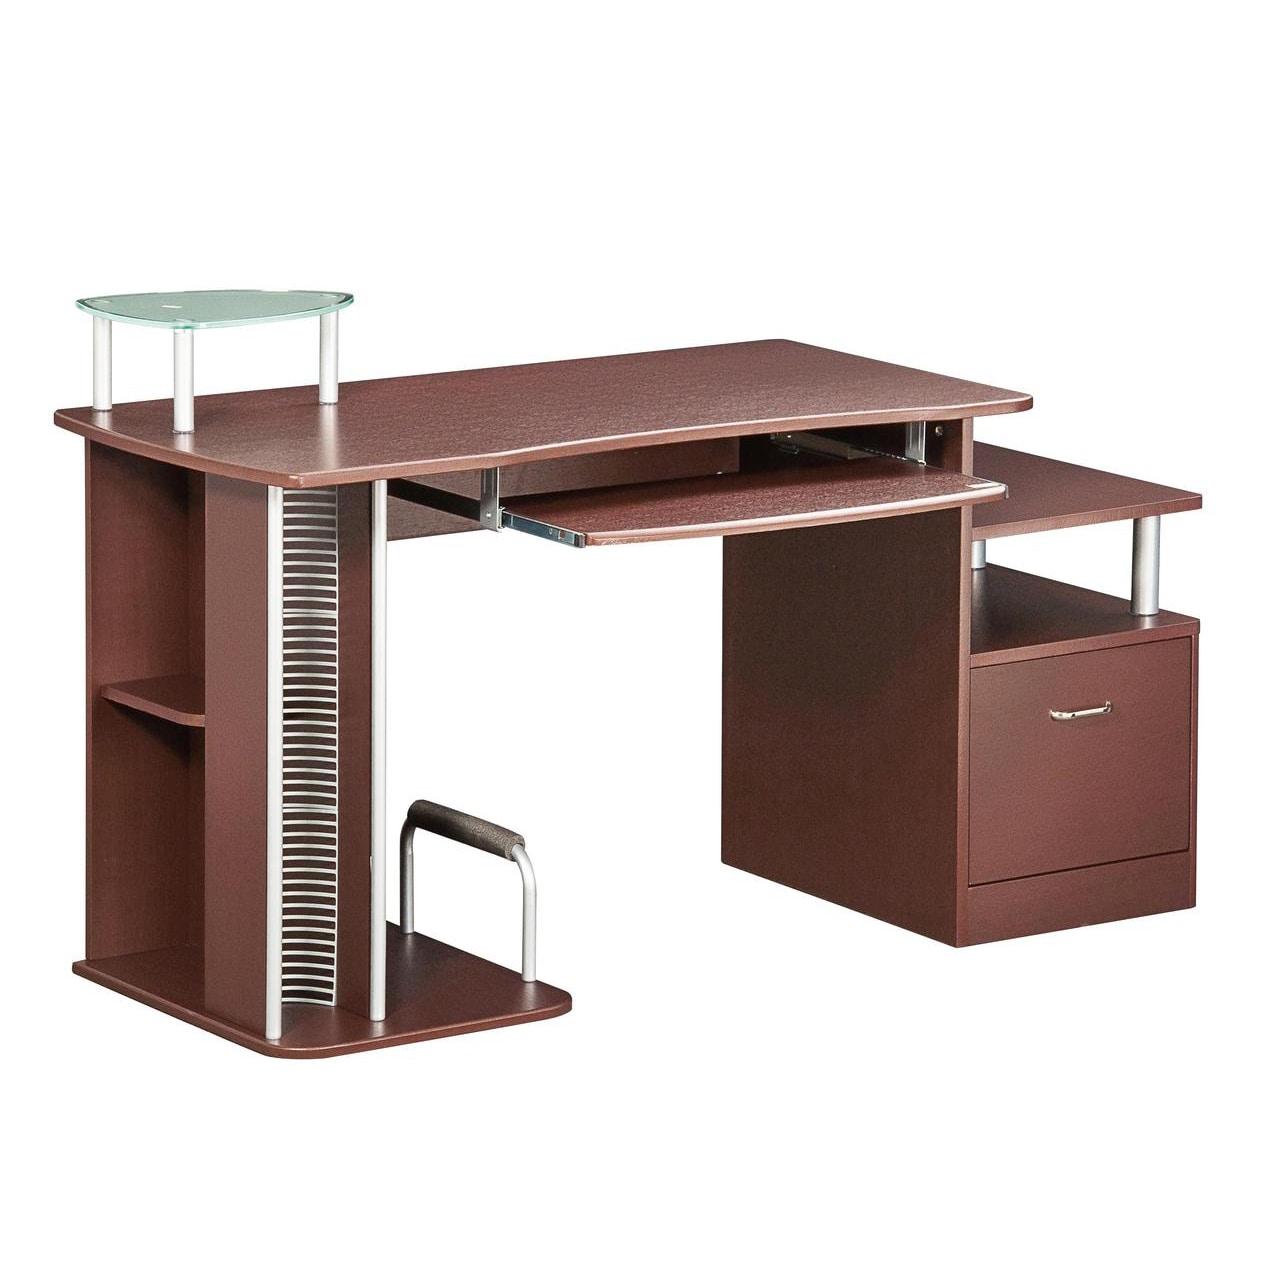 Deluxe Ergonomic Multifunction Computer Desk (Chocolate),...